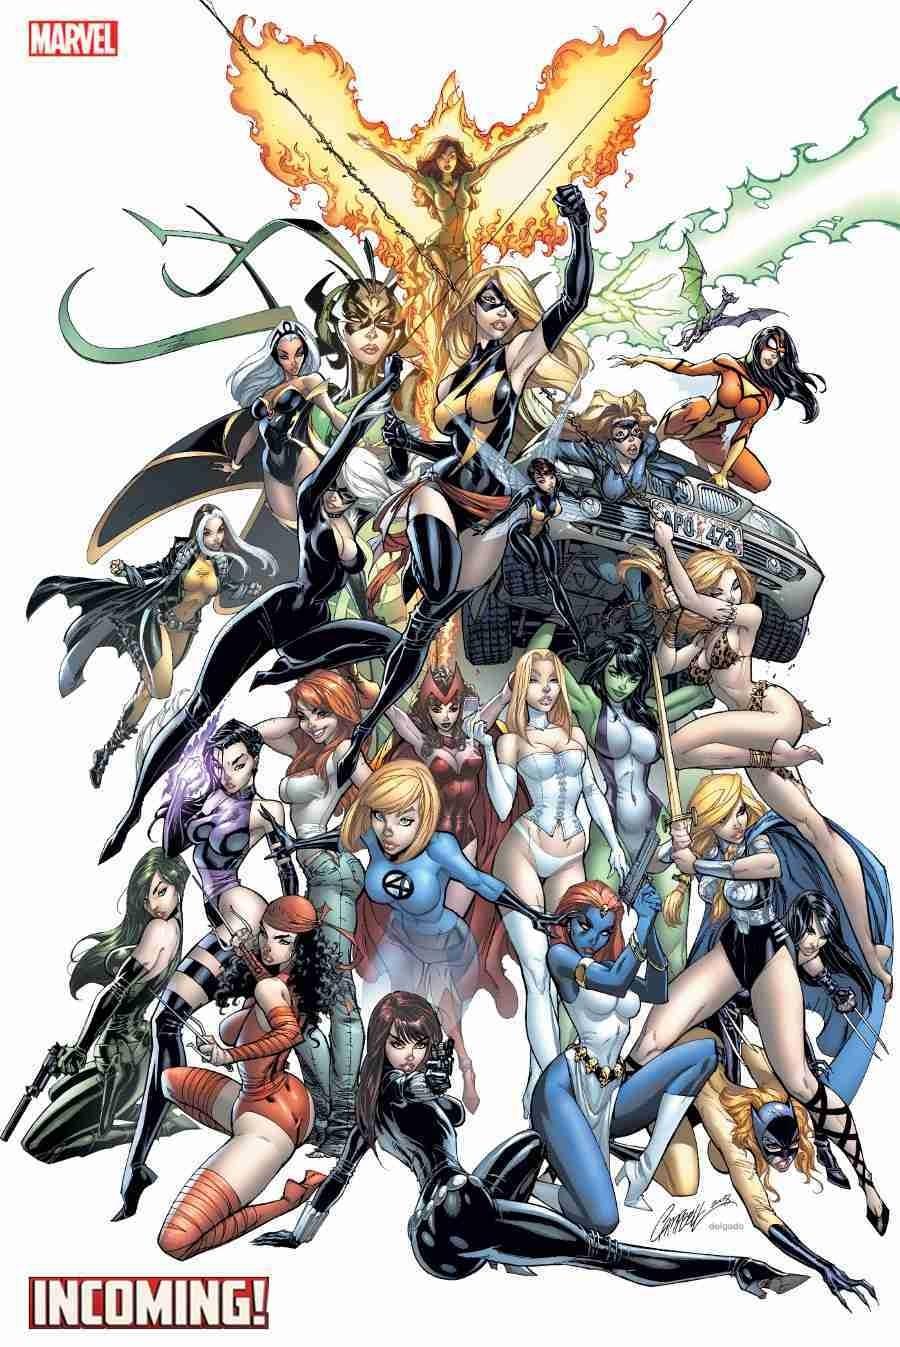 Marvel Unveils J. Scott Campbell Incoming Variant